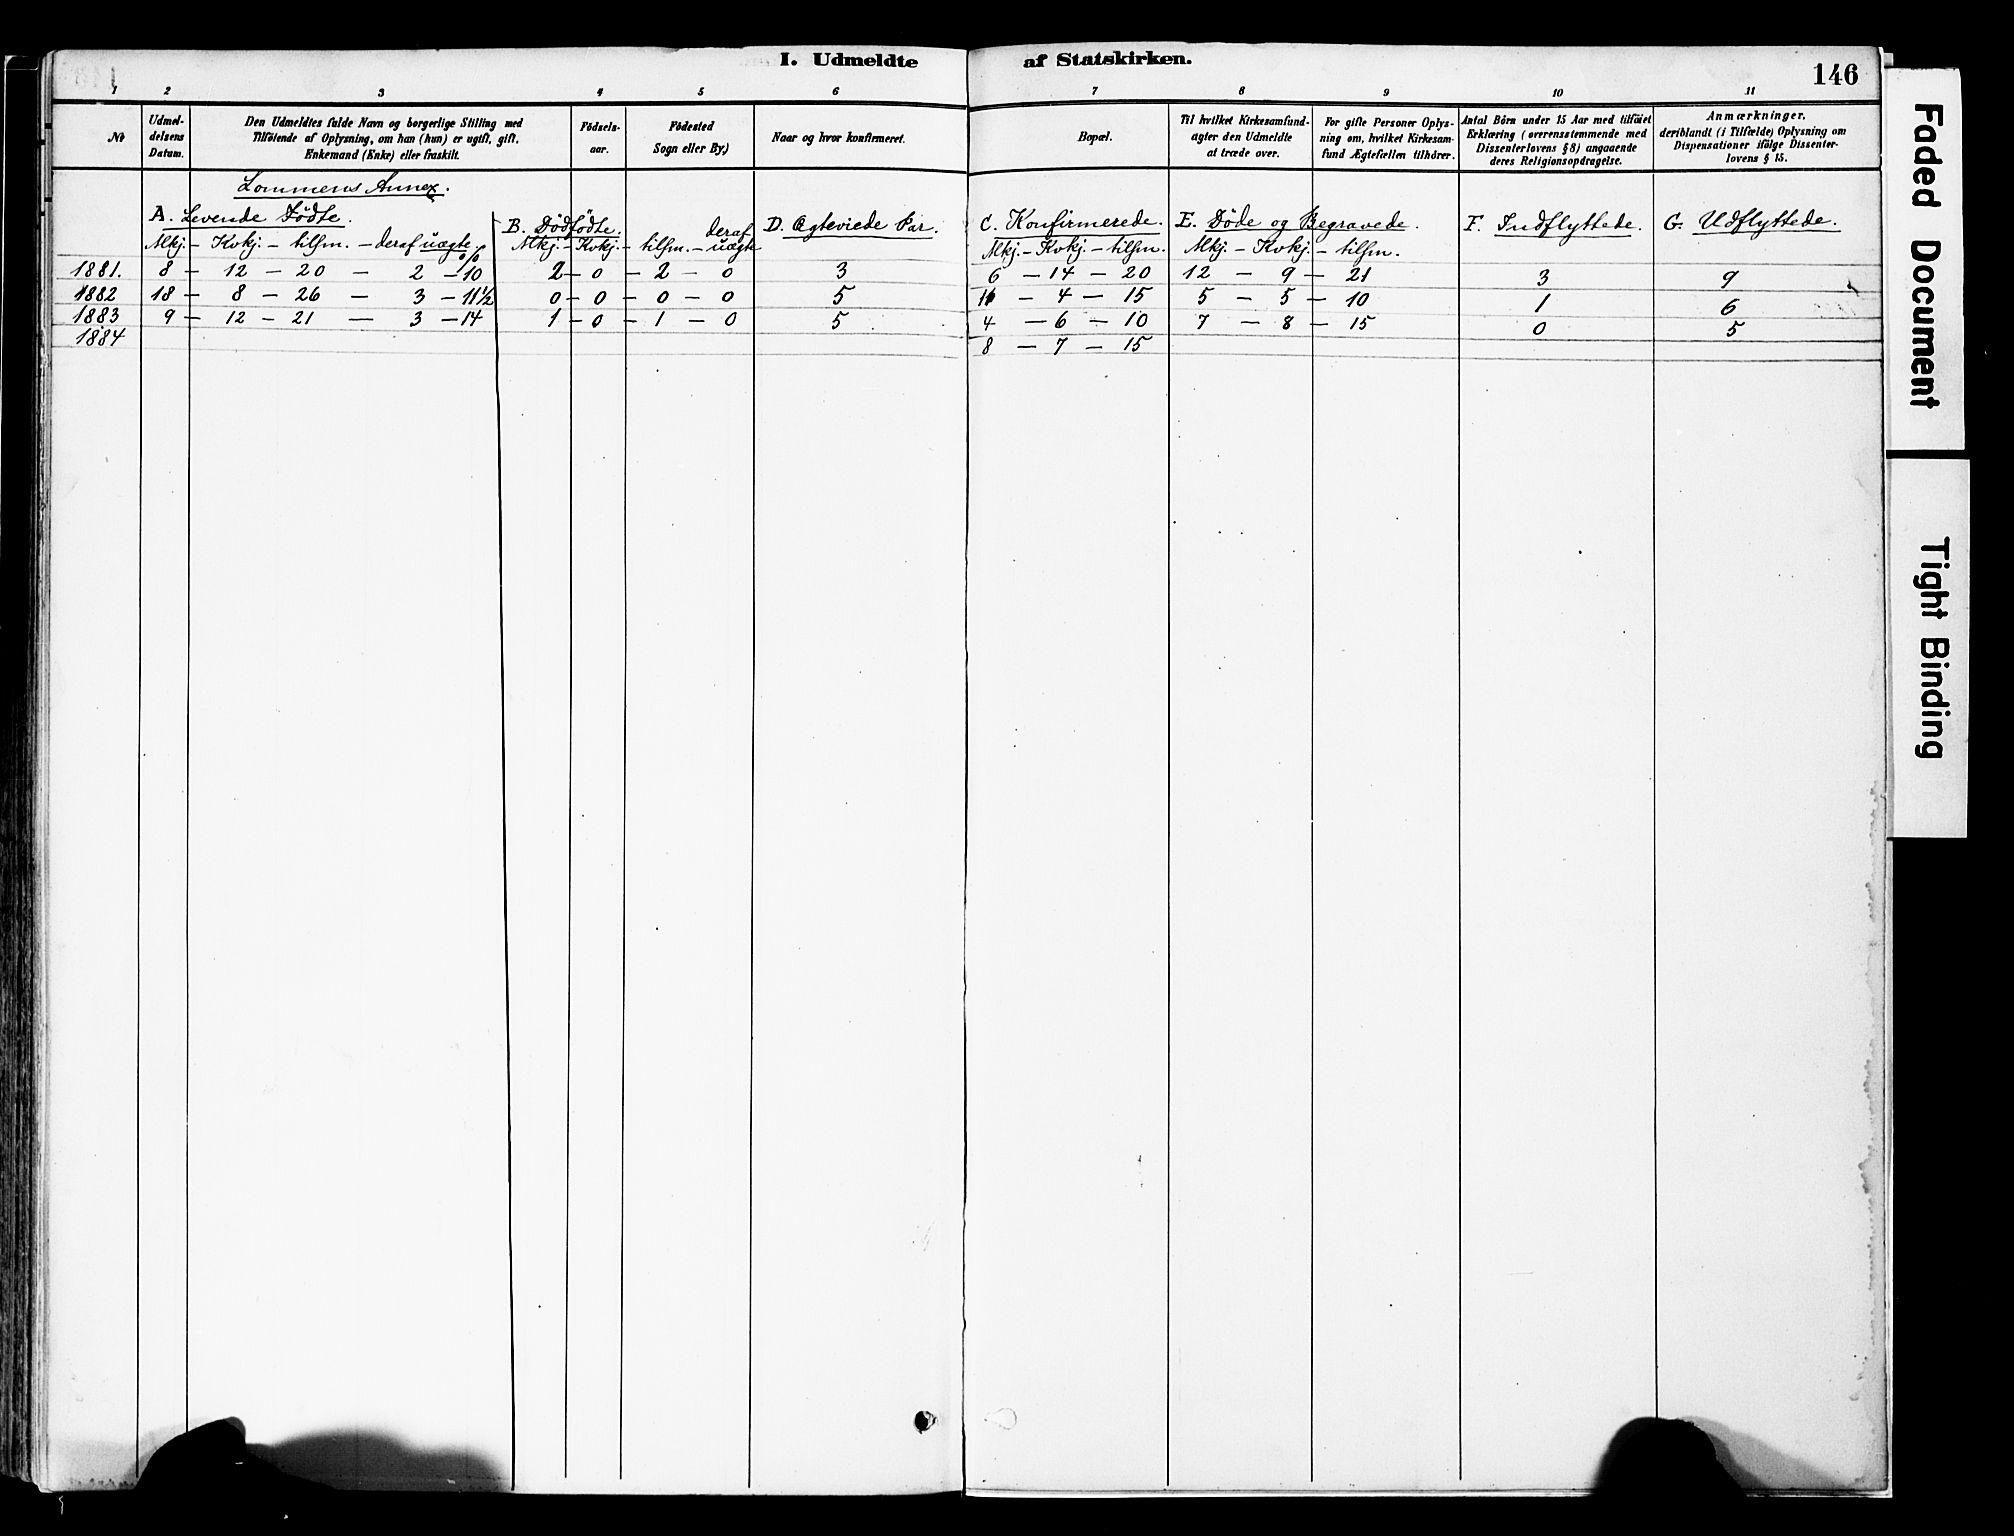 SAH, Vestre Slidre prestekontor, Ministerialbok nr. 5, 1881-1912, s. 146